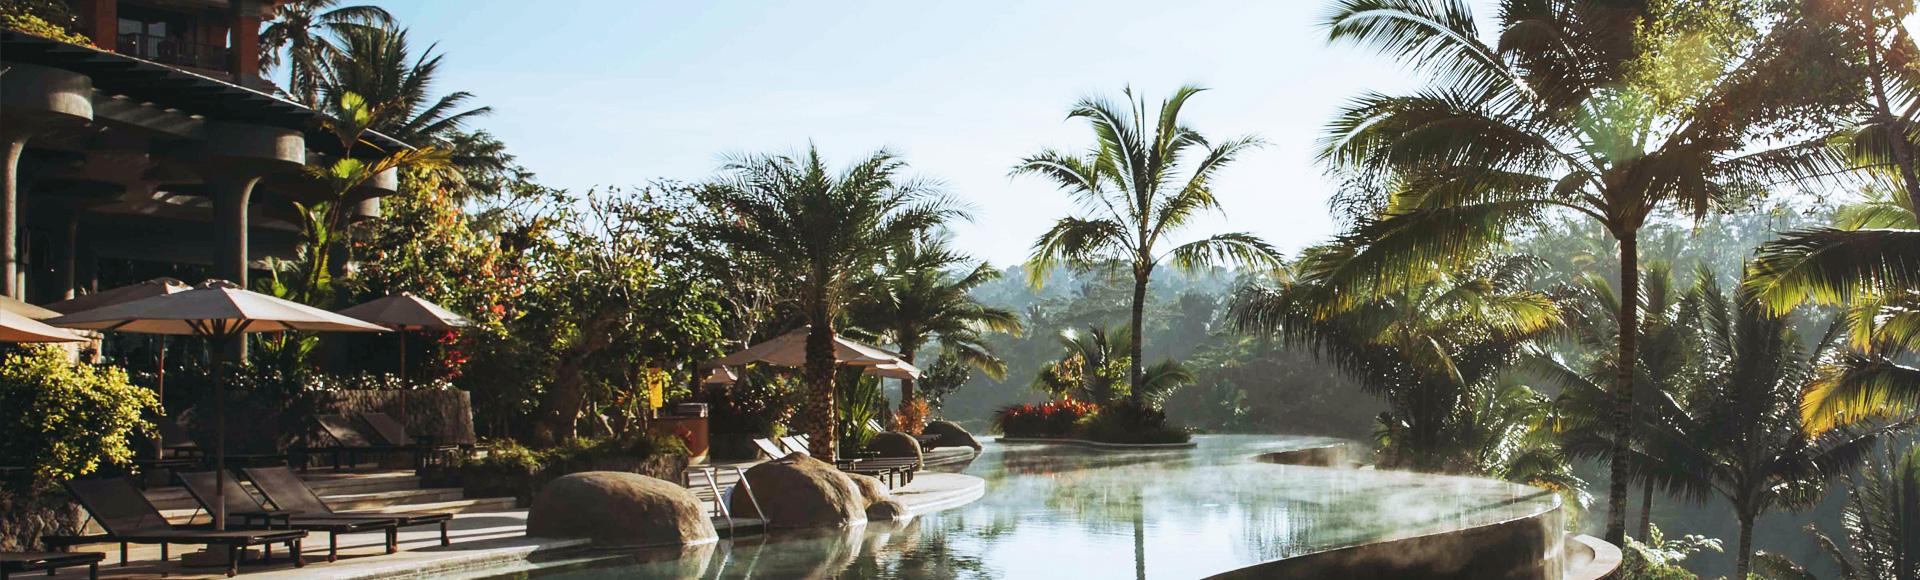 Ubud, Bali Retreat, Padma Resort